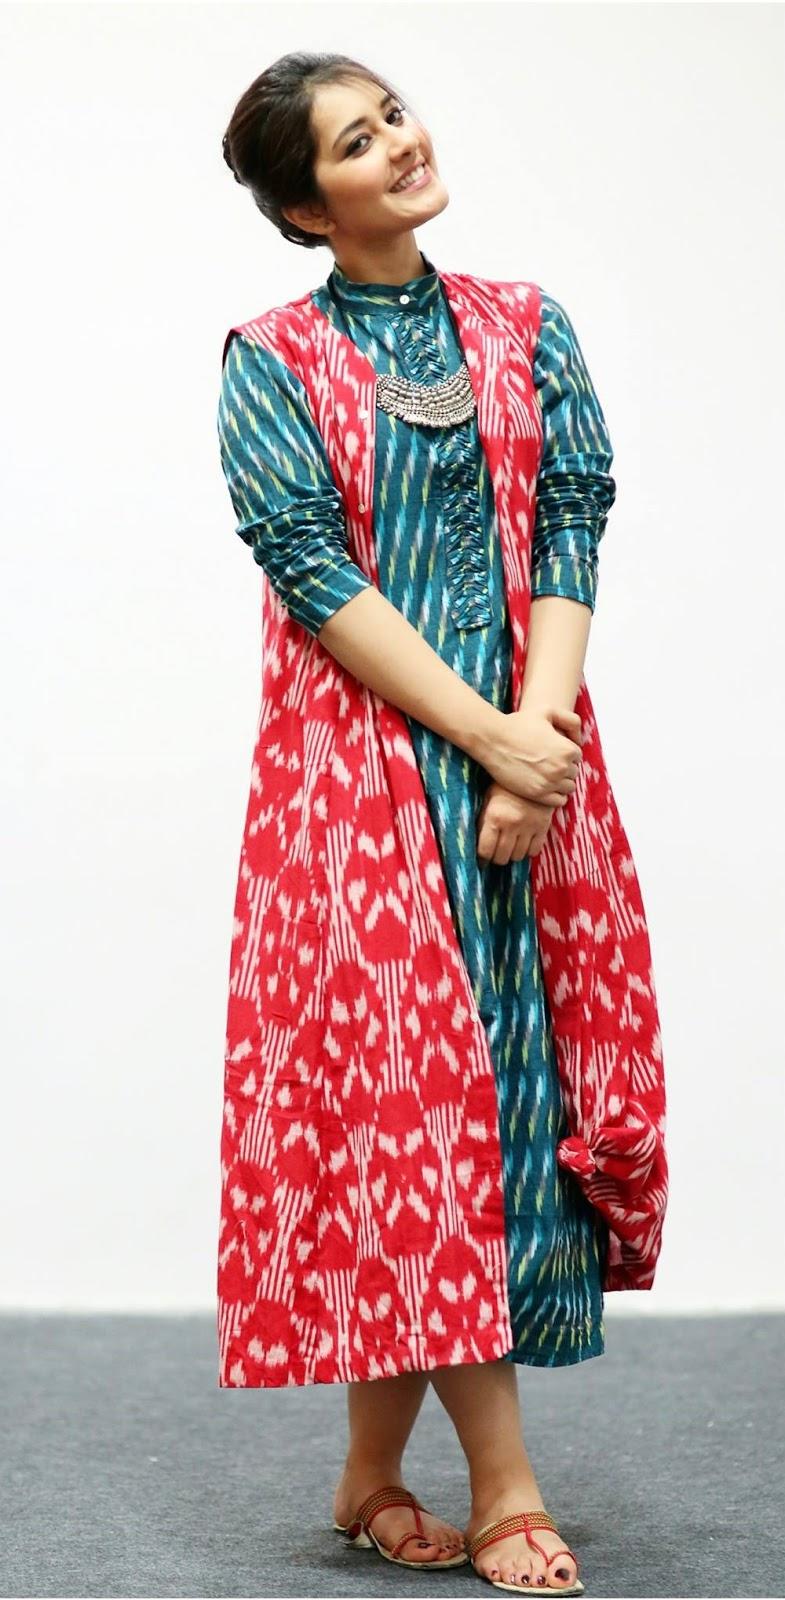 Hot Photoshoot Of Rashi Khanna In Red Dress